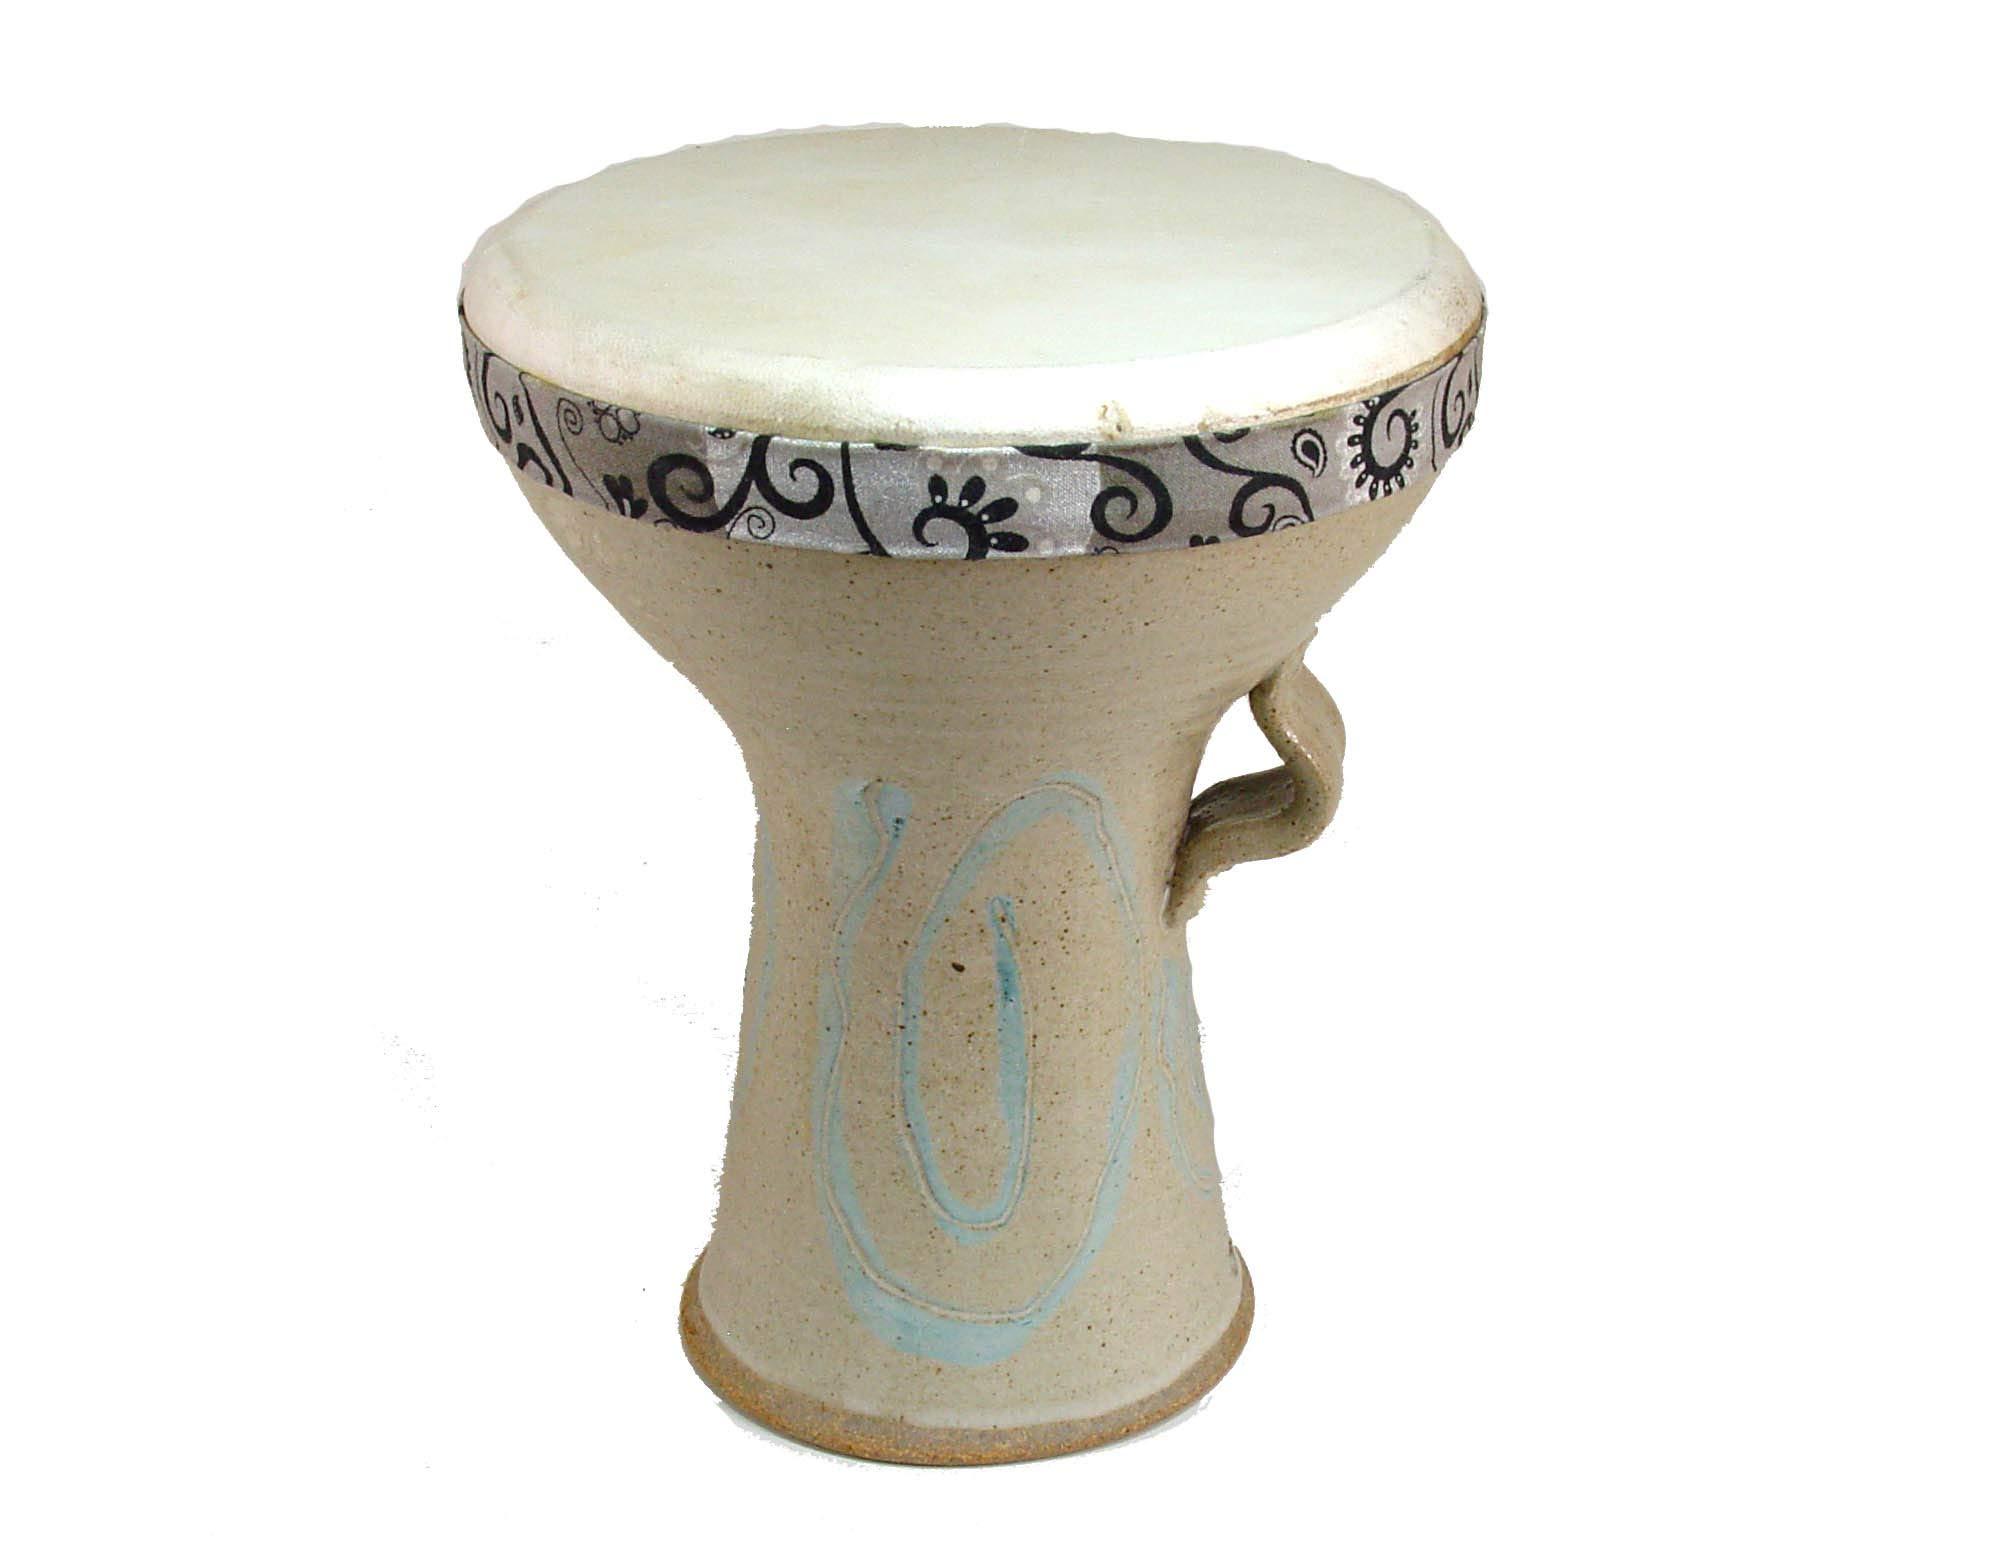 Stoneware Doumbek Darbuka Hand Drum, Spiral Design Goat Skin Head